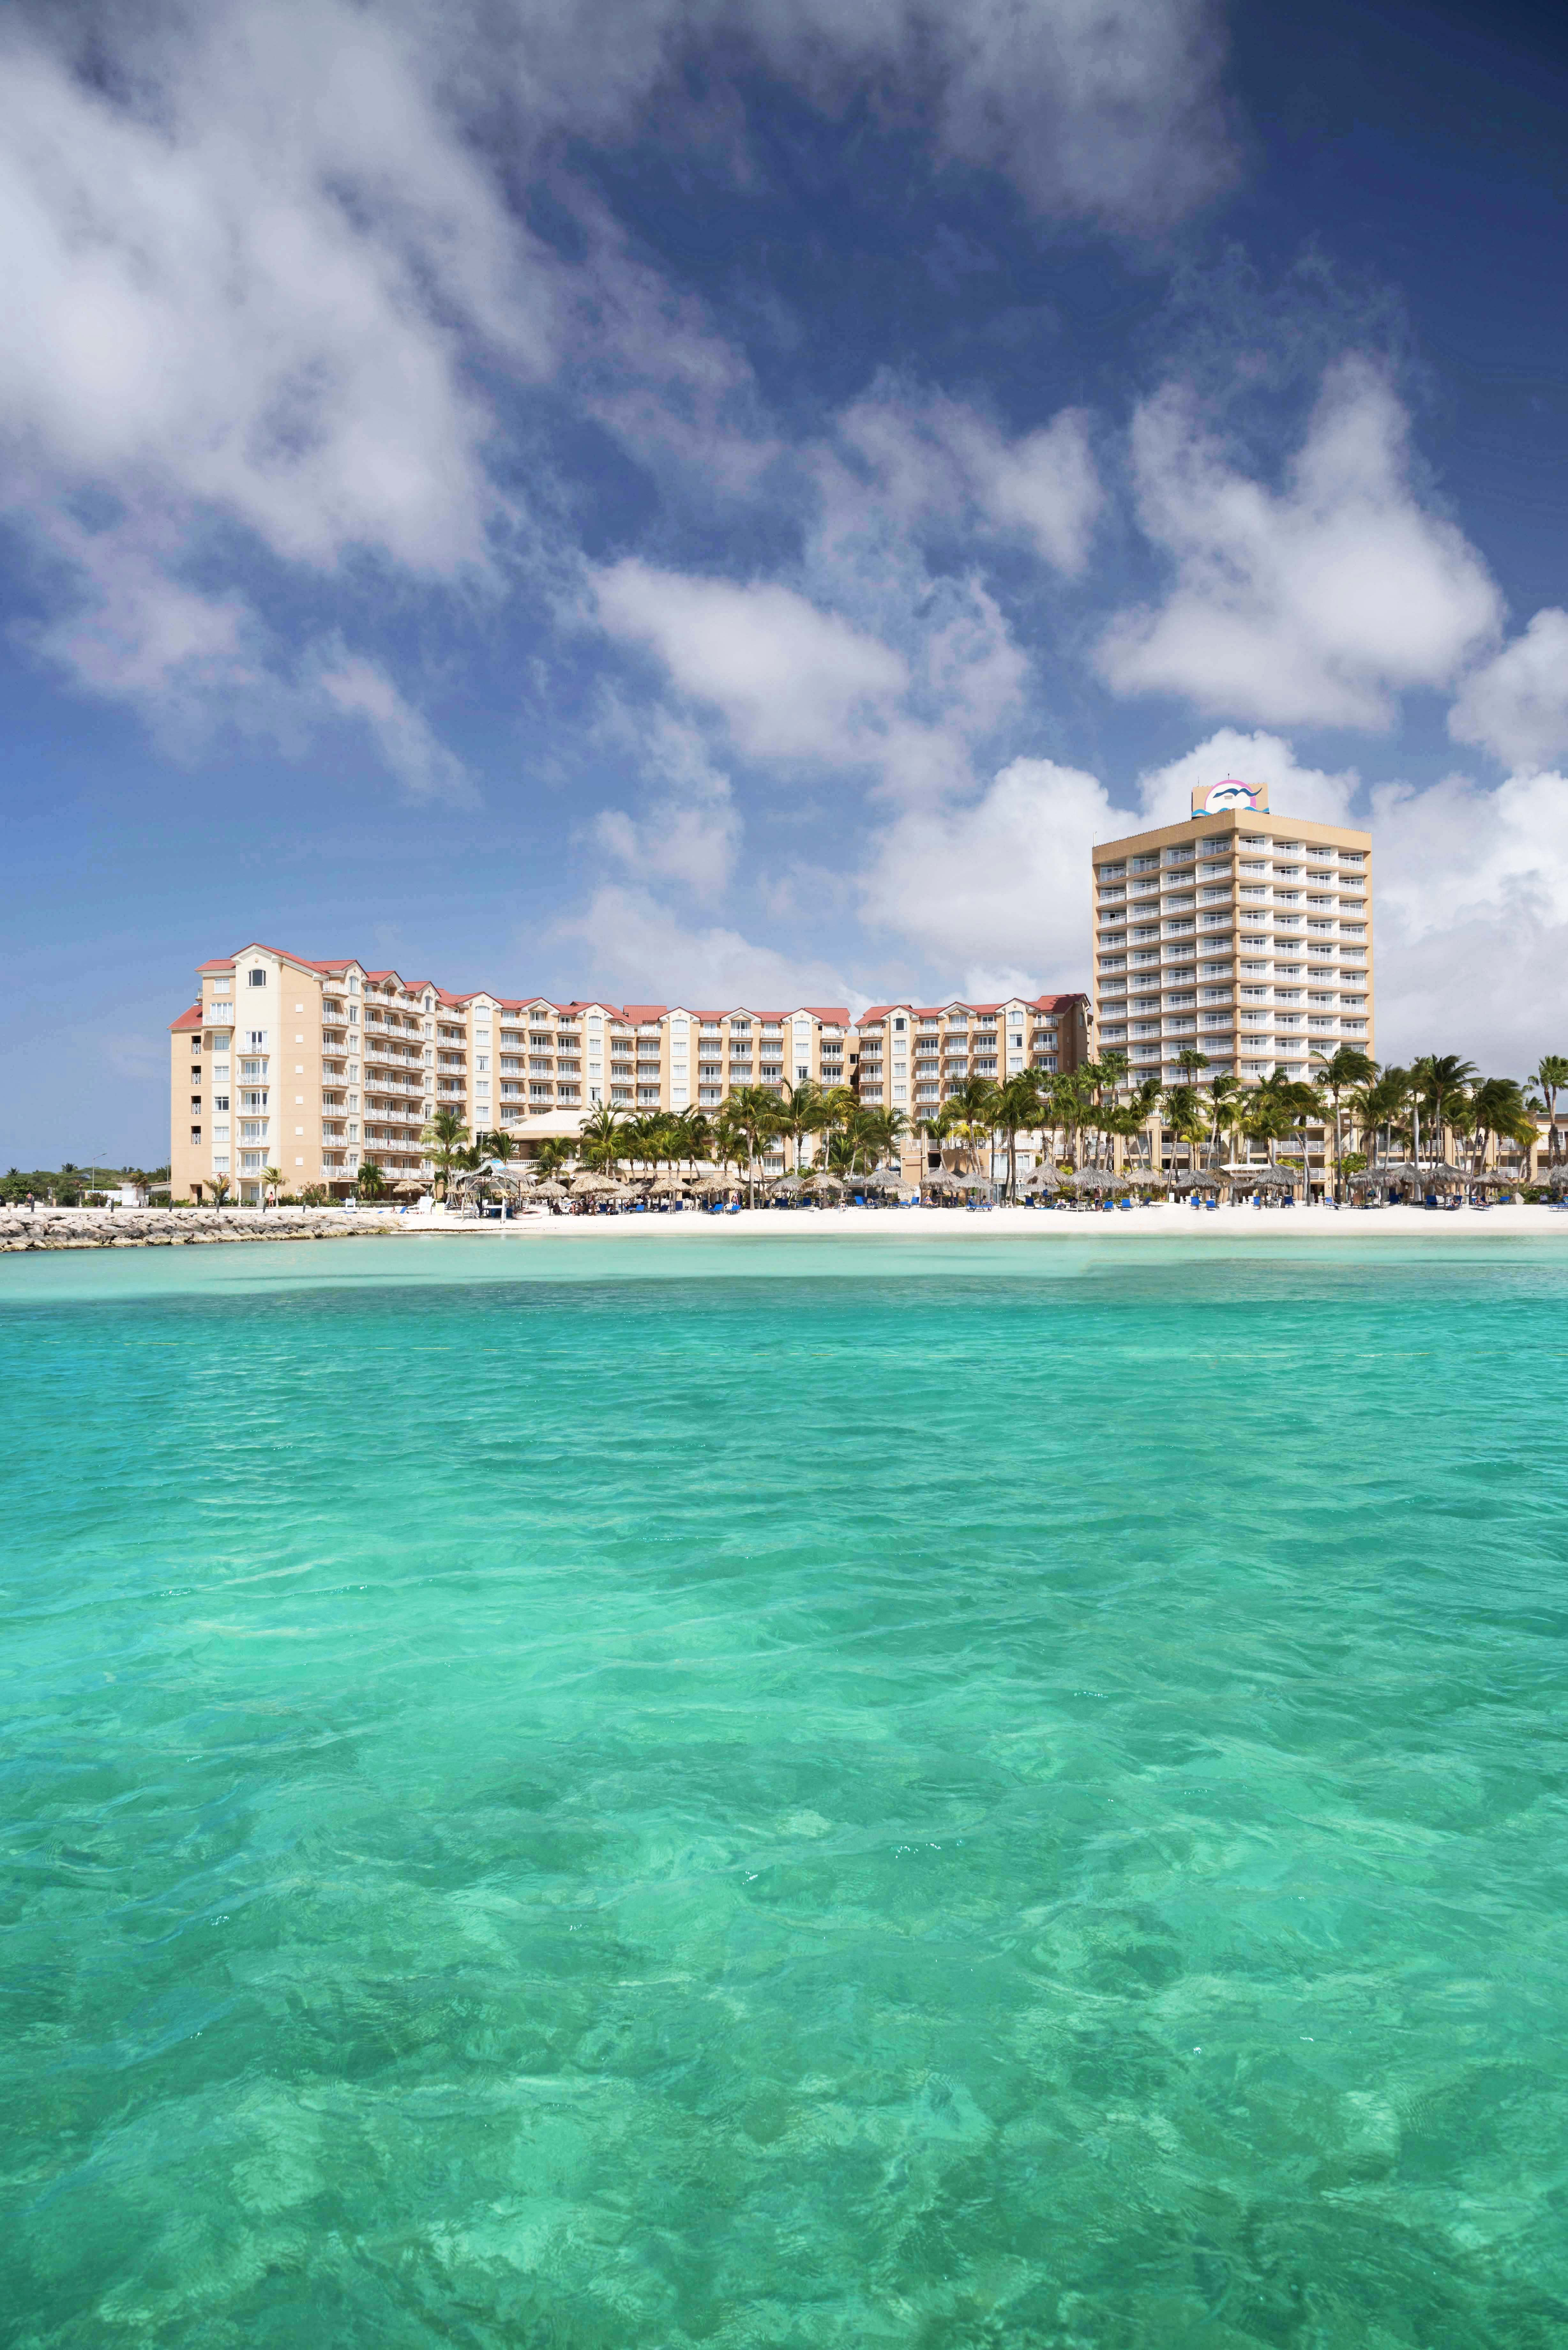 Divi resorts sponsors aruba s soul beach music festival featuring r b star alicia keys - Divi phoenix aruba ...